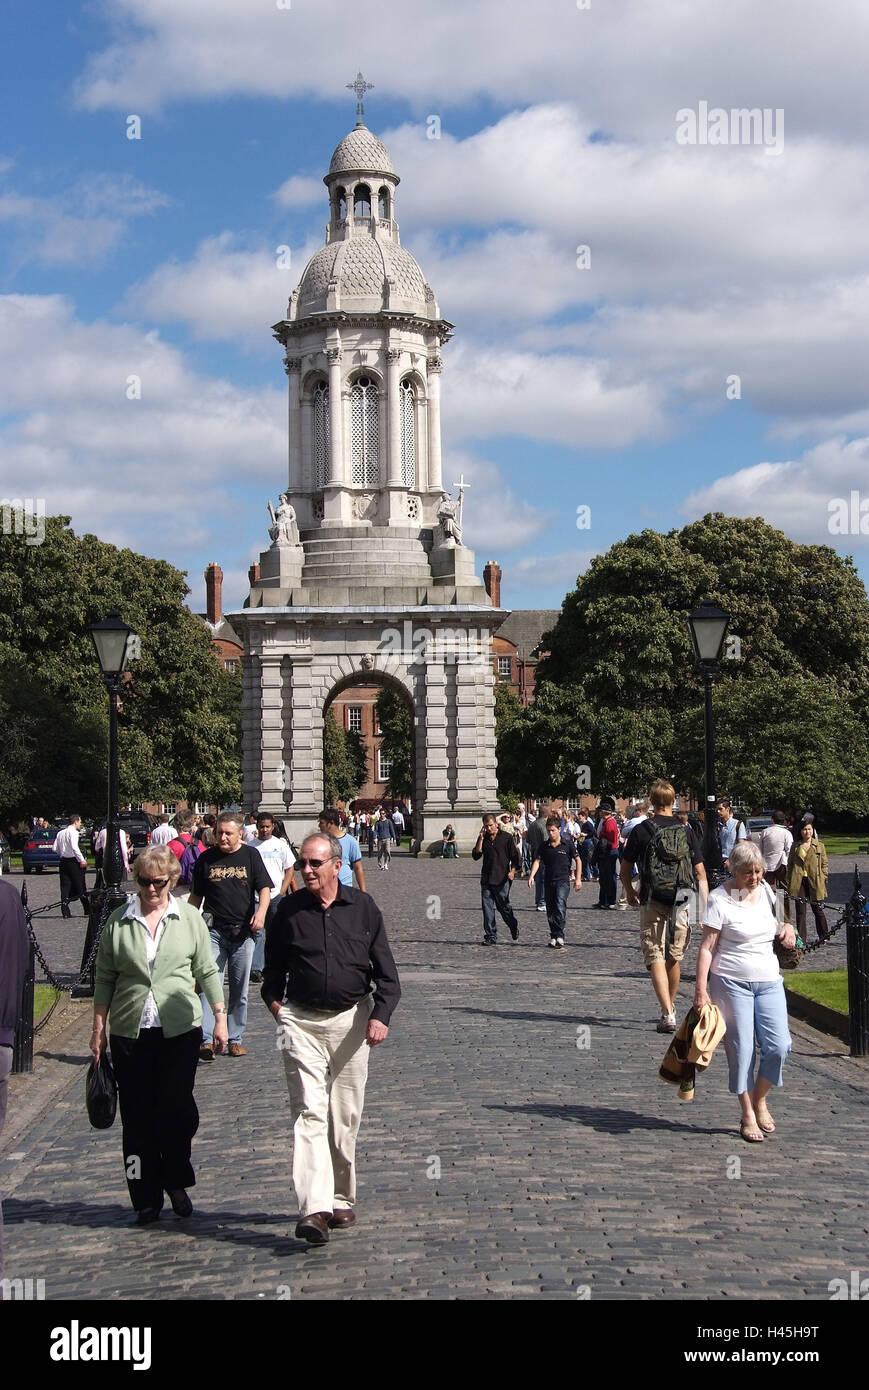 Ireland, Dublin, Trinity College, campanile, - Stock Image